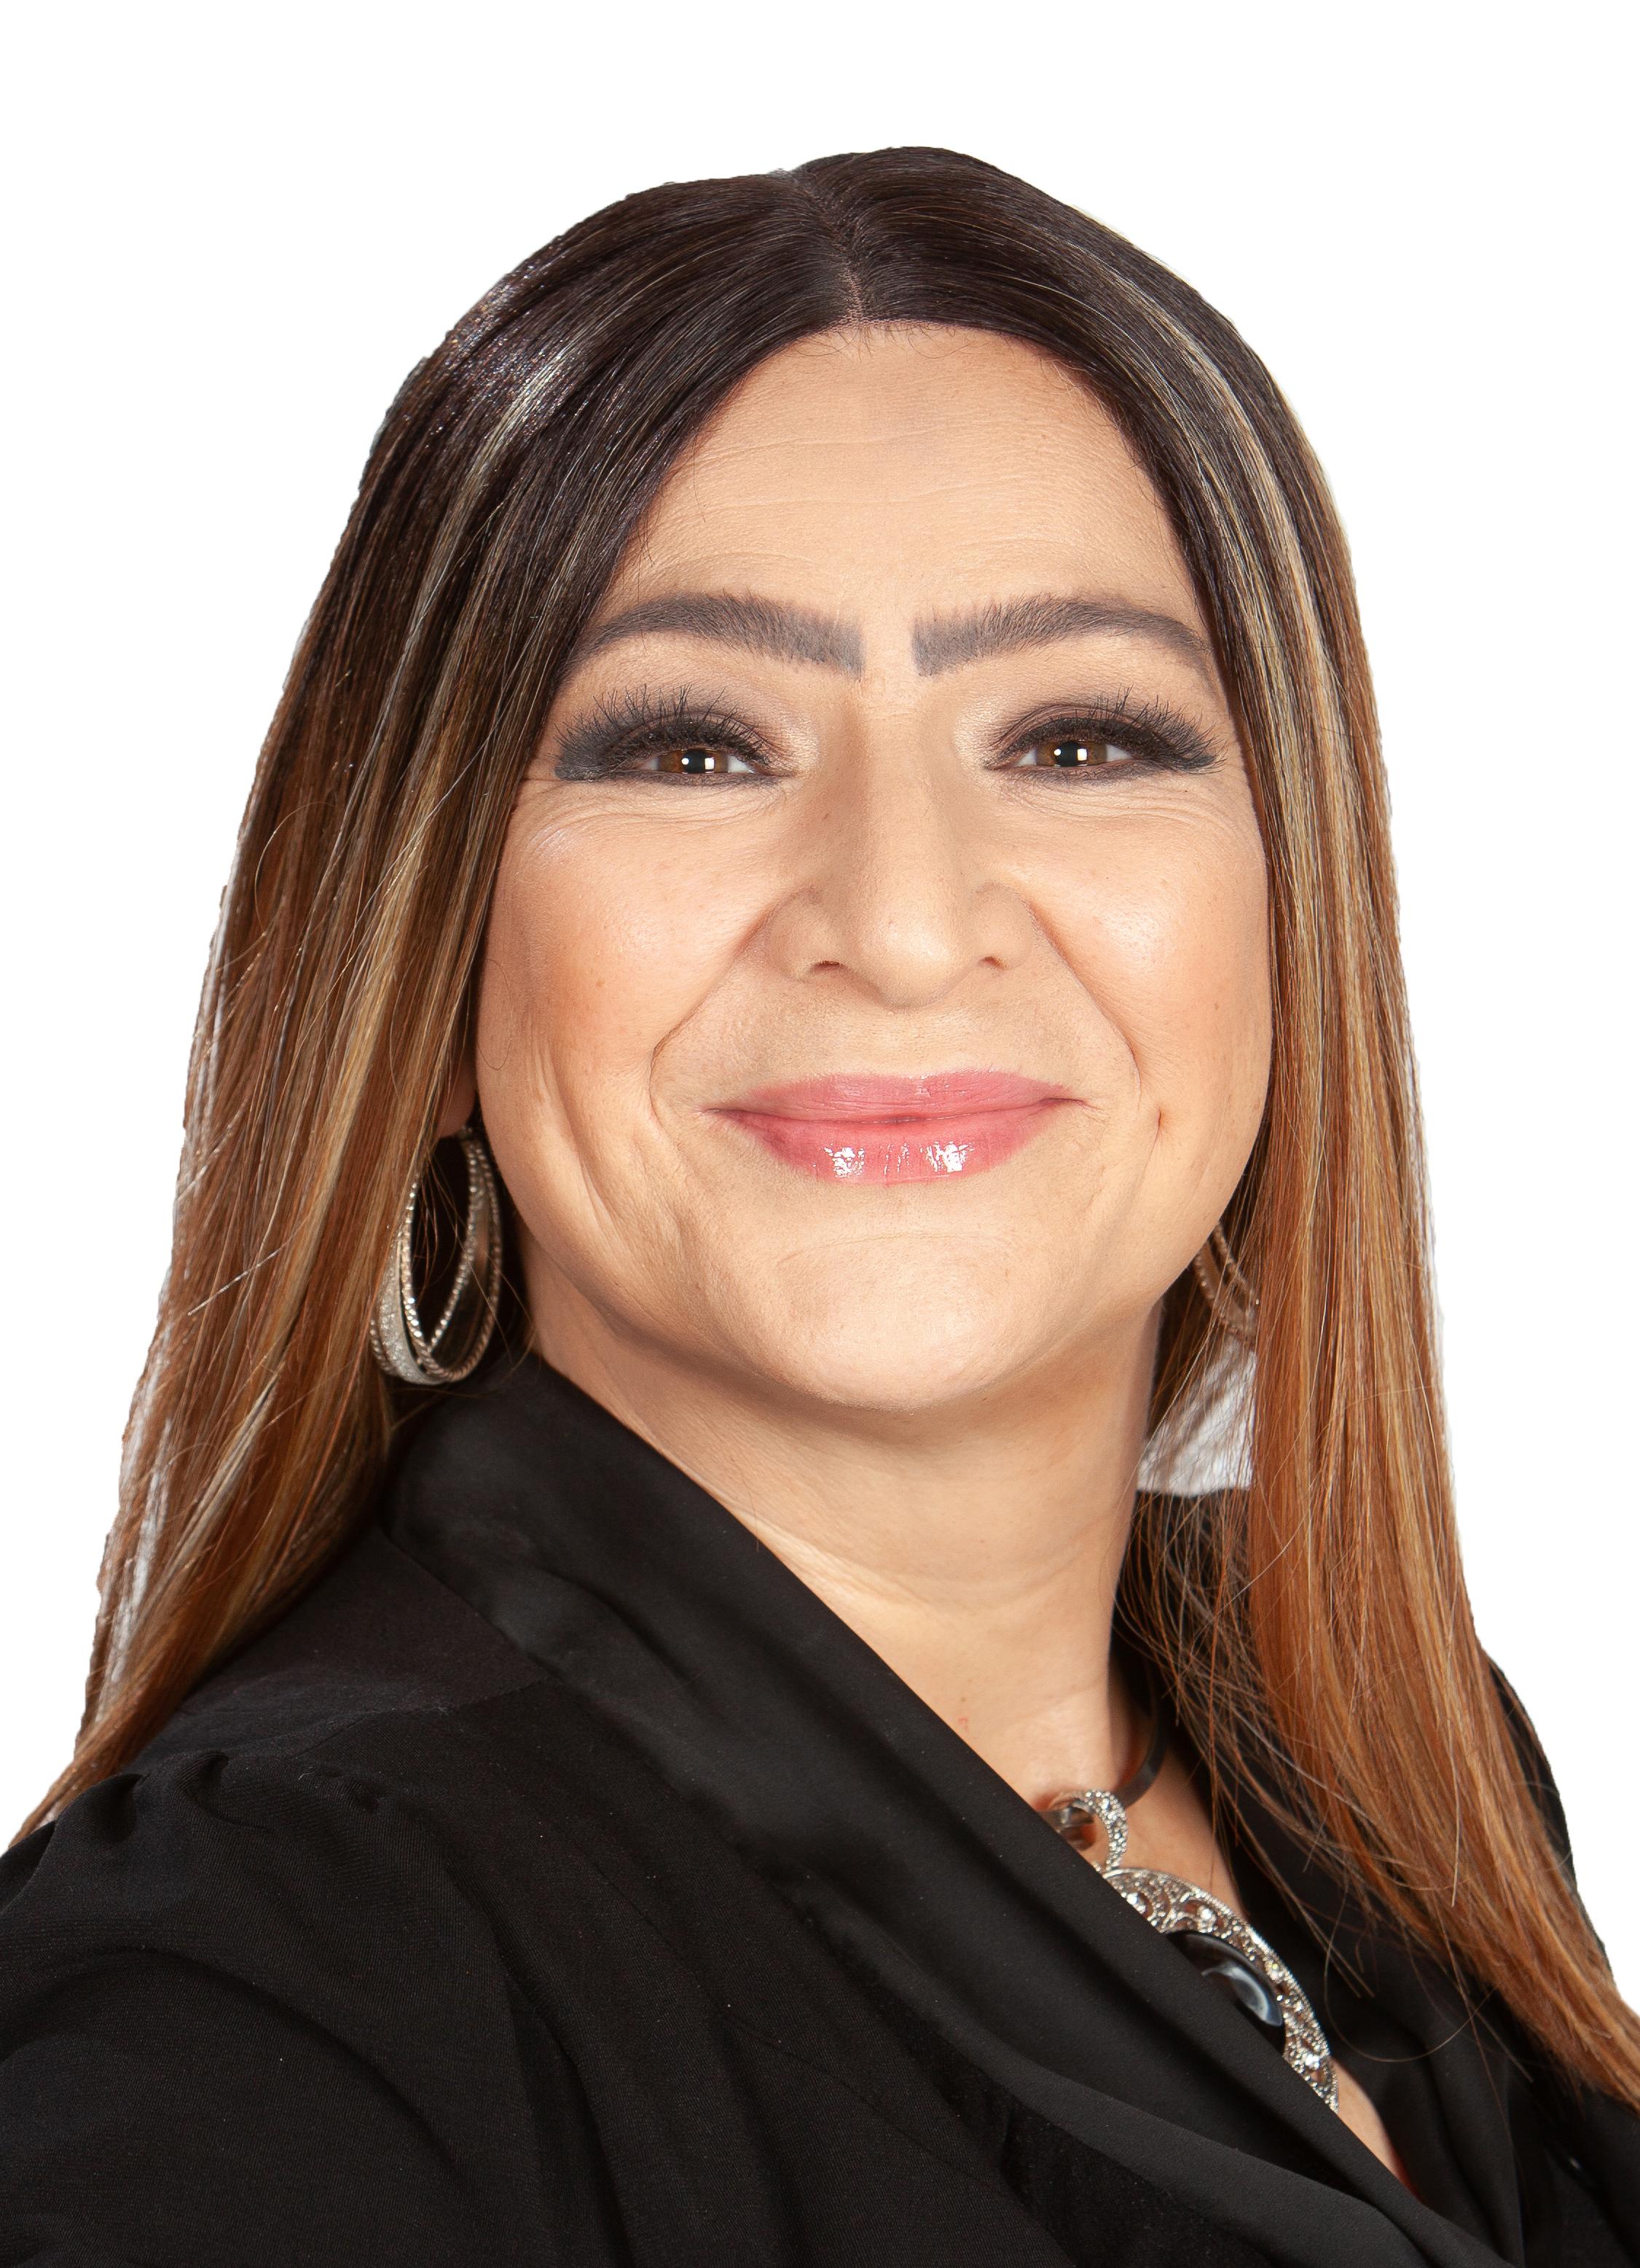 Sandra undefined Lopez-Gallardo